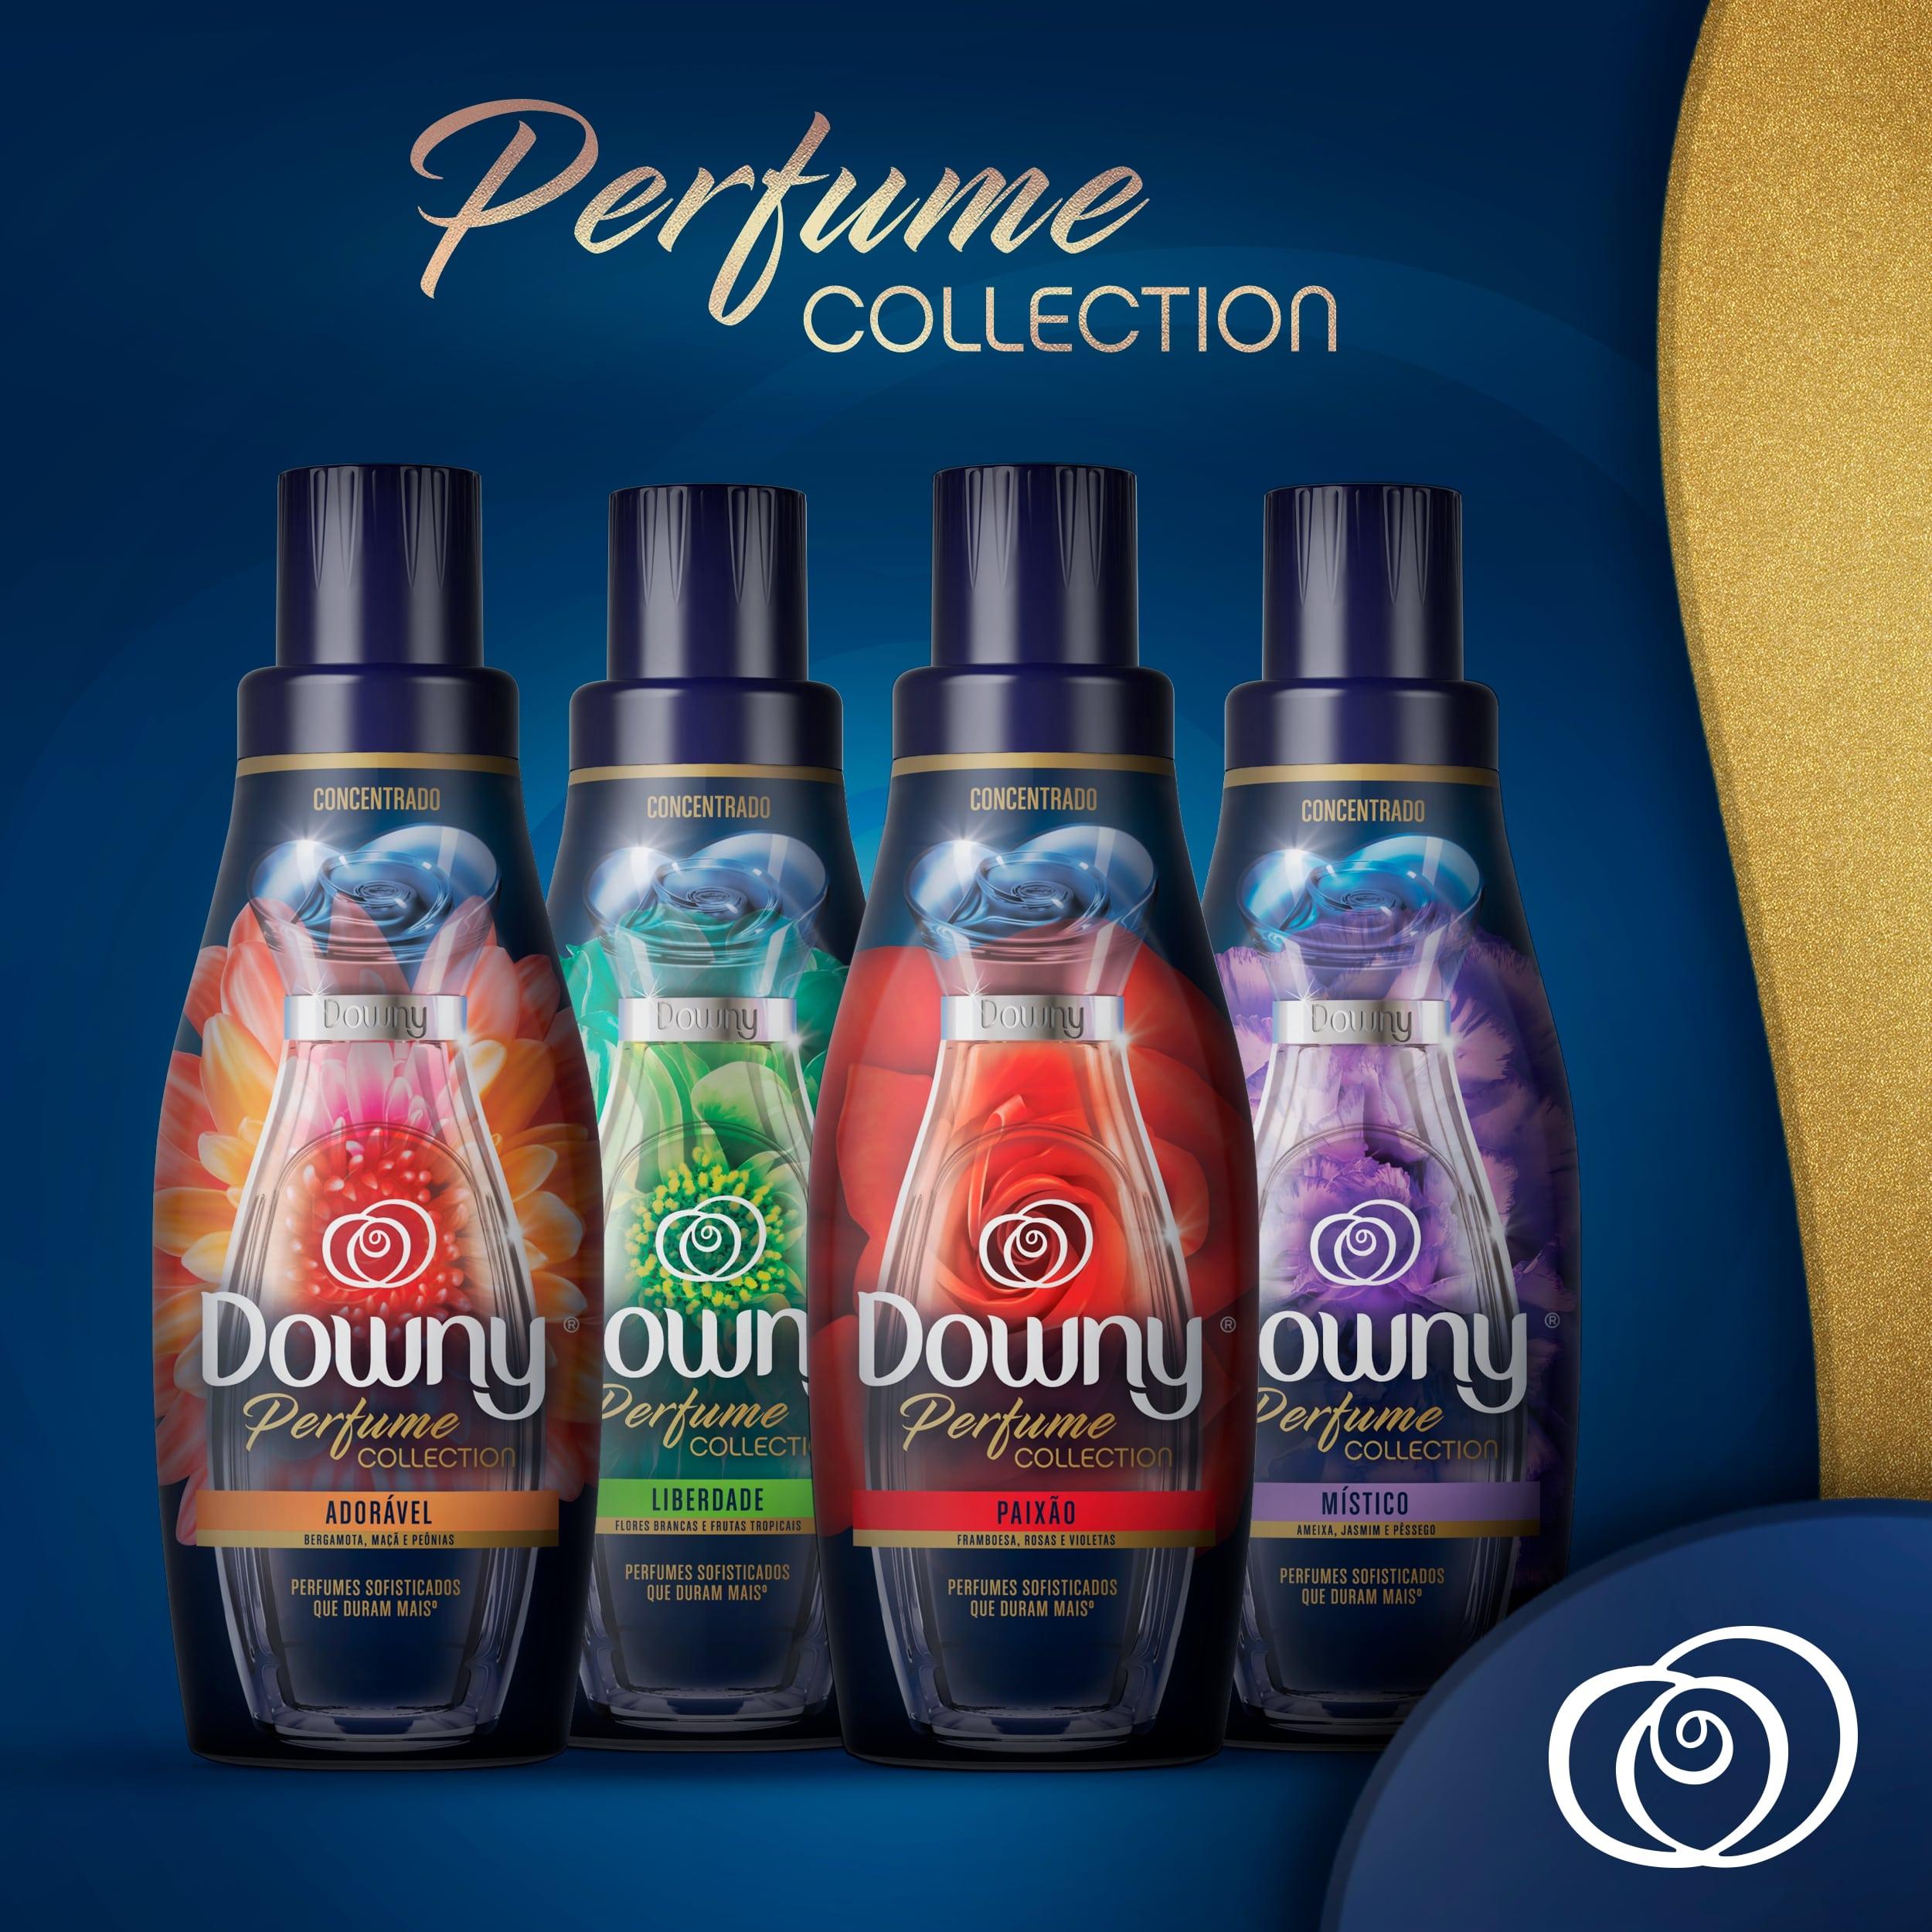 Amaciante Downy Perfume Collection Liberdade Secondary 04